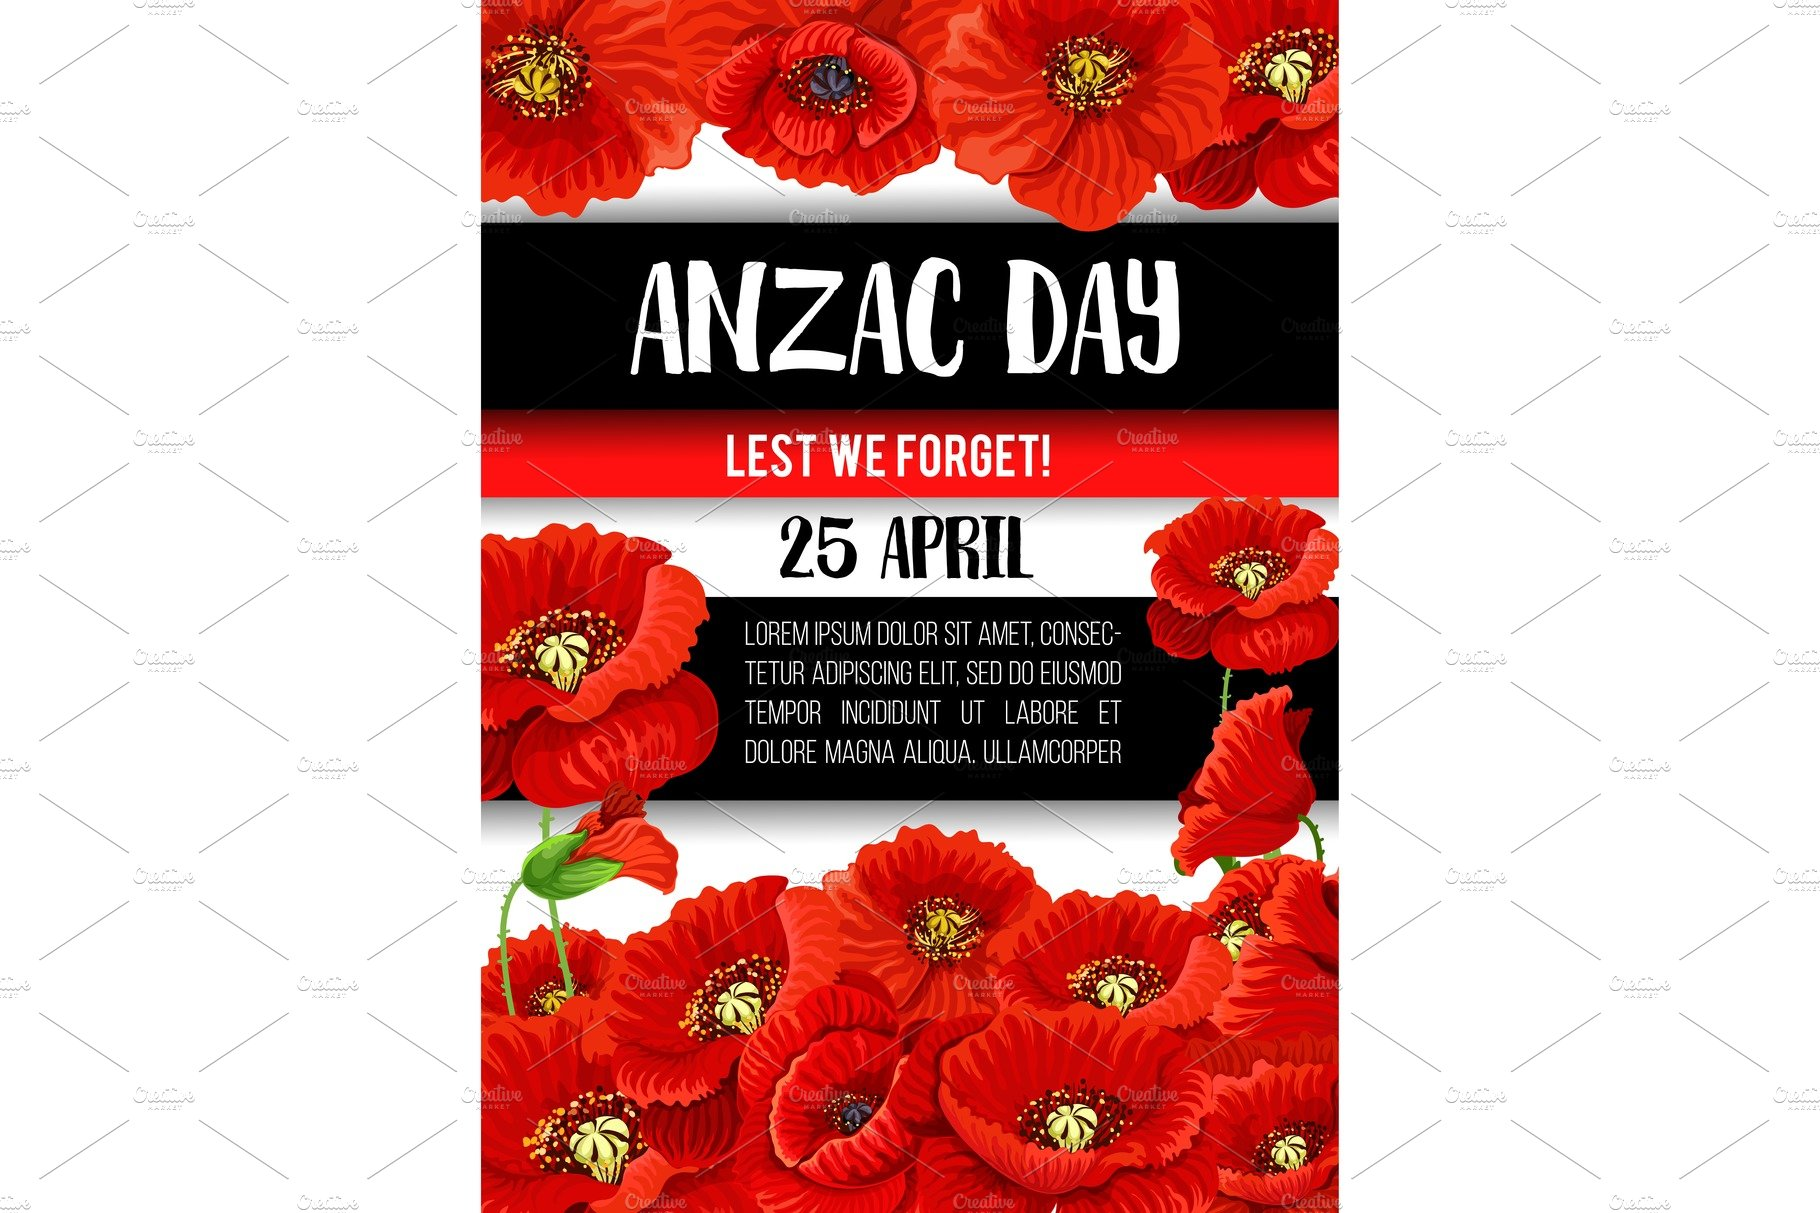 Anzac Day Poppy Flower Memorial Banner Design Illustrations